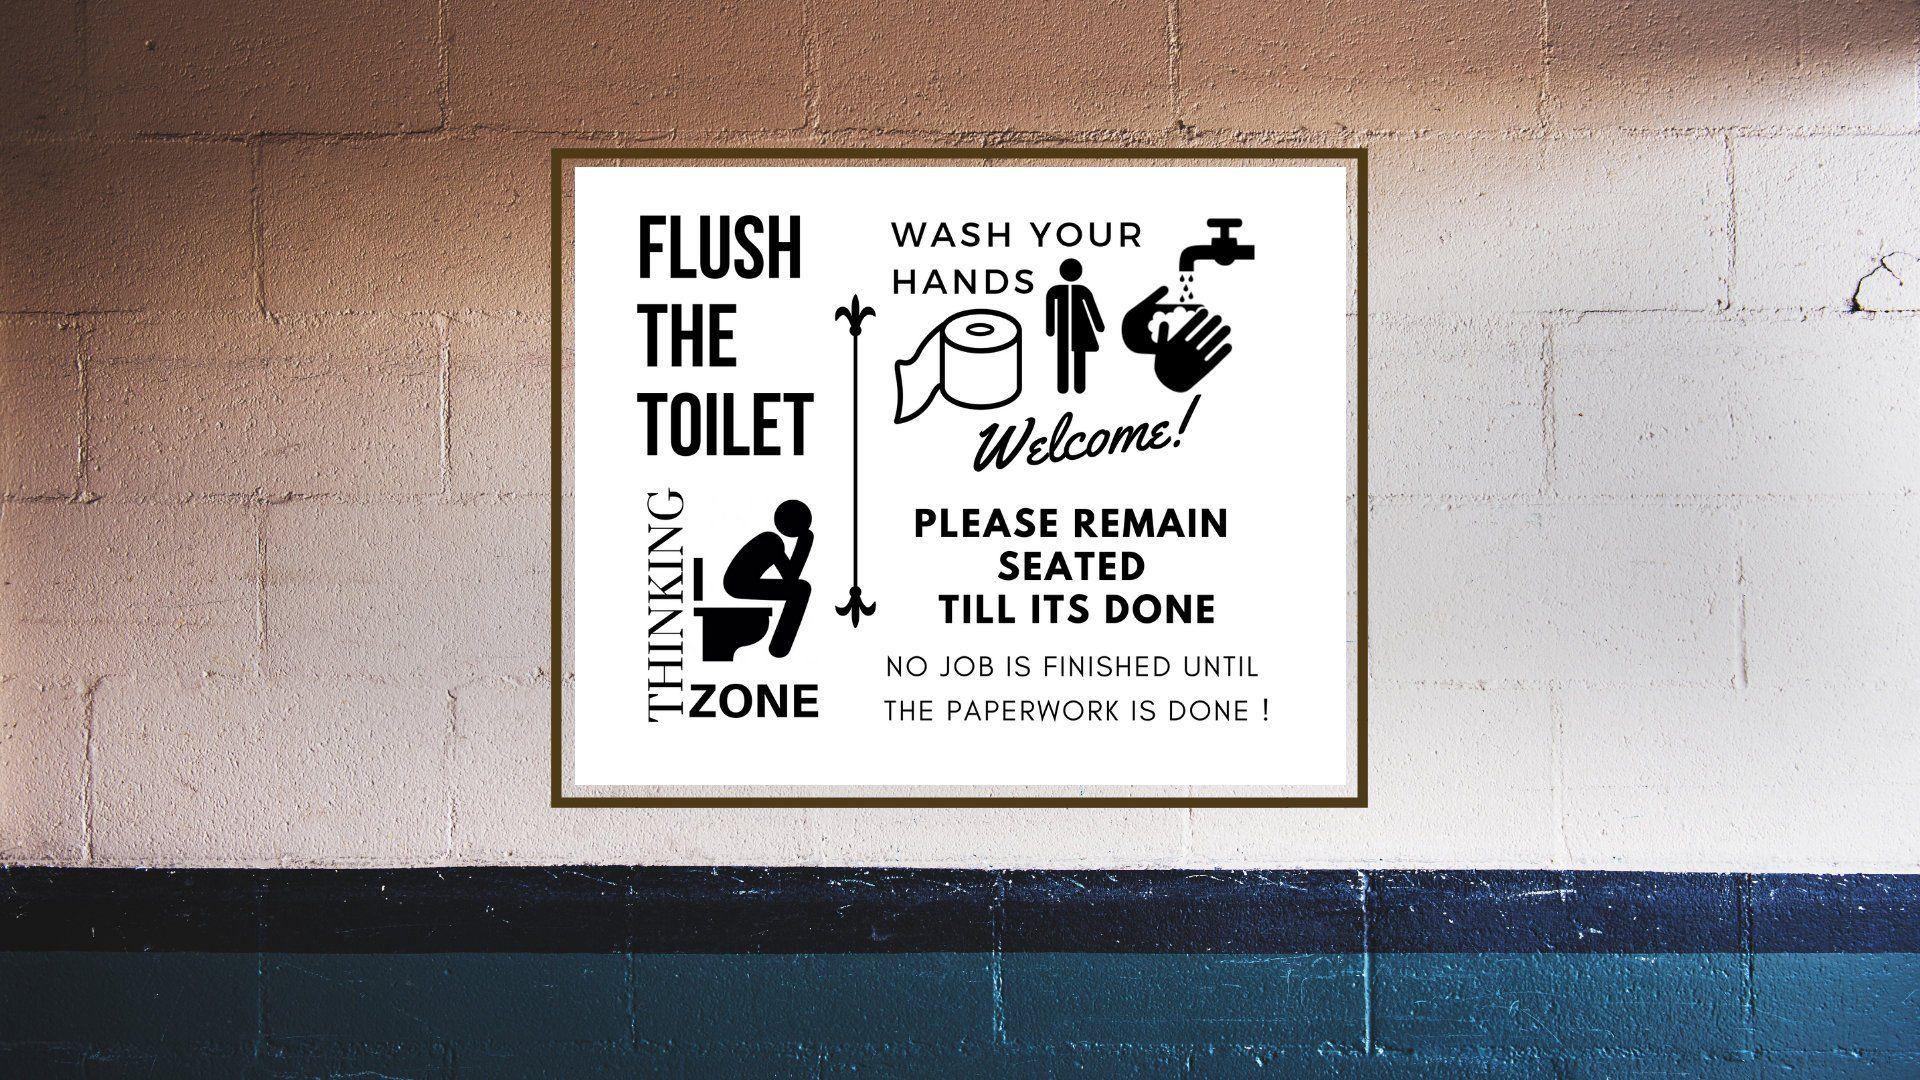 Flush The Toilet Sign Landscape Wash Your Hands Welcome Toilet Rules Toilet Sign Toilet Print Toilet Humor Toile Toilet Rules Toilet Sign Toilet Humor